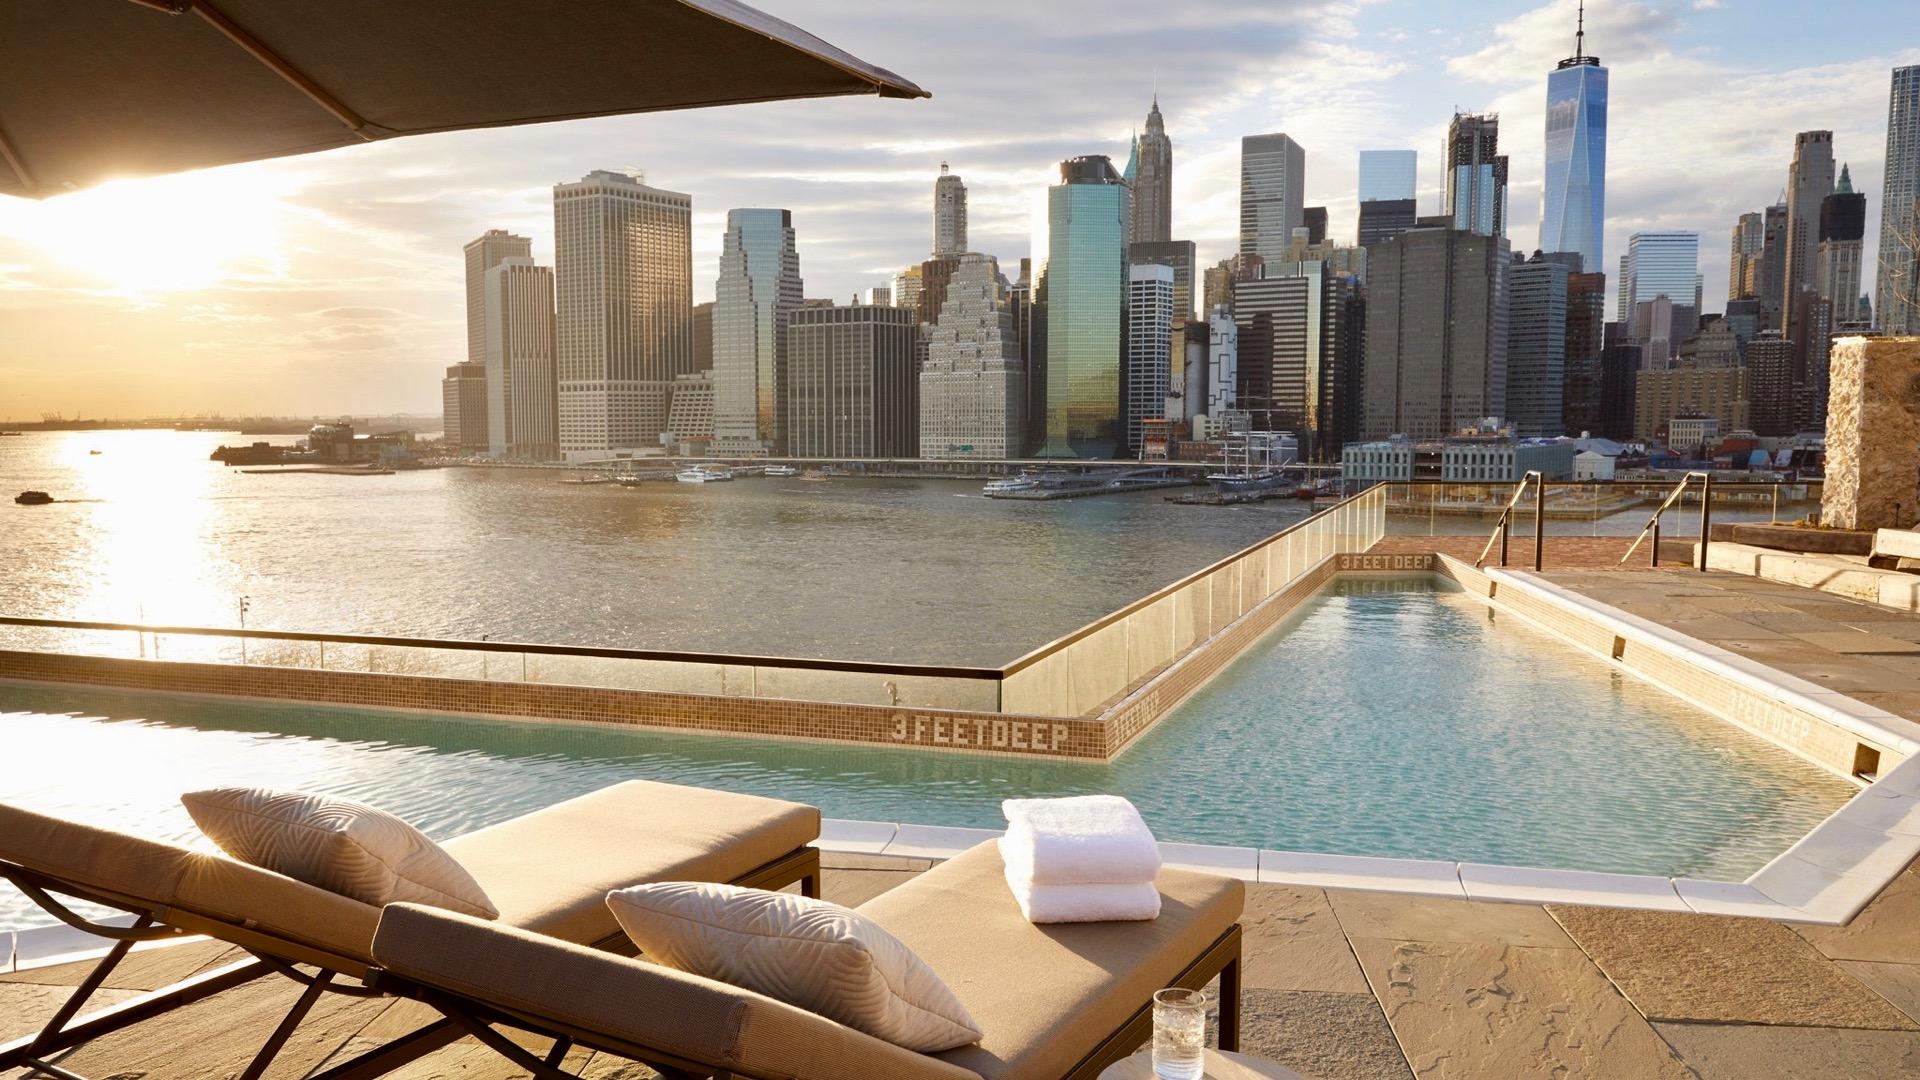 Bamford Haybarn Spa 1 Hotel Brooklyn Bridge Spas Of America